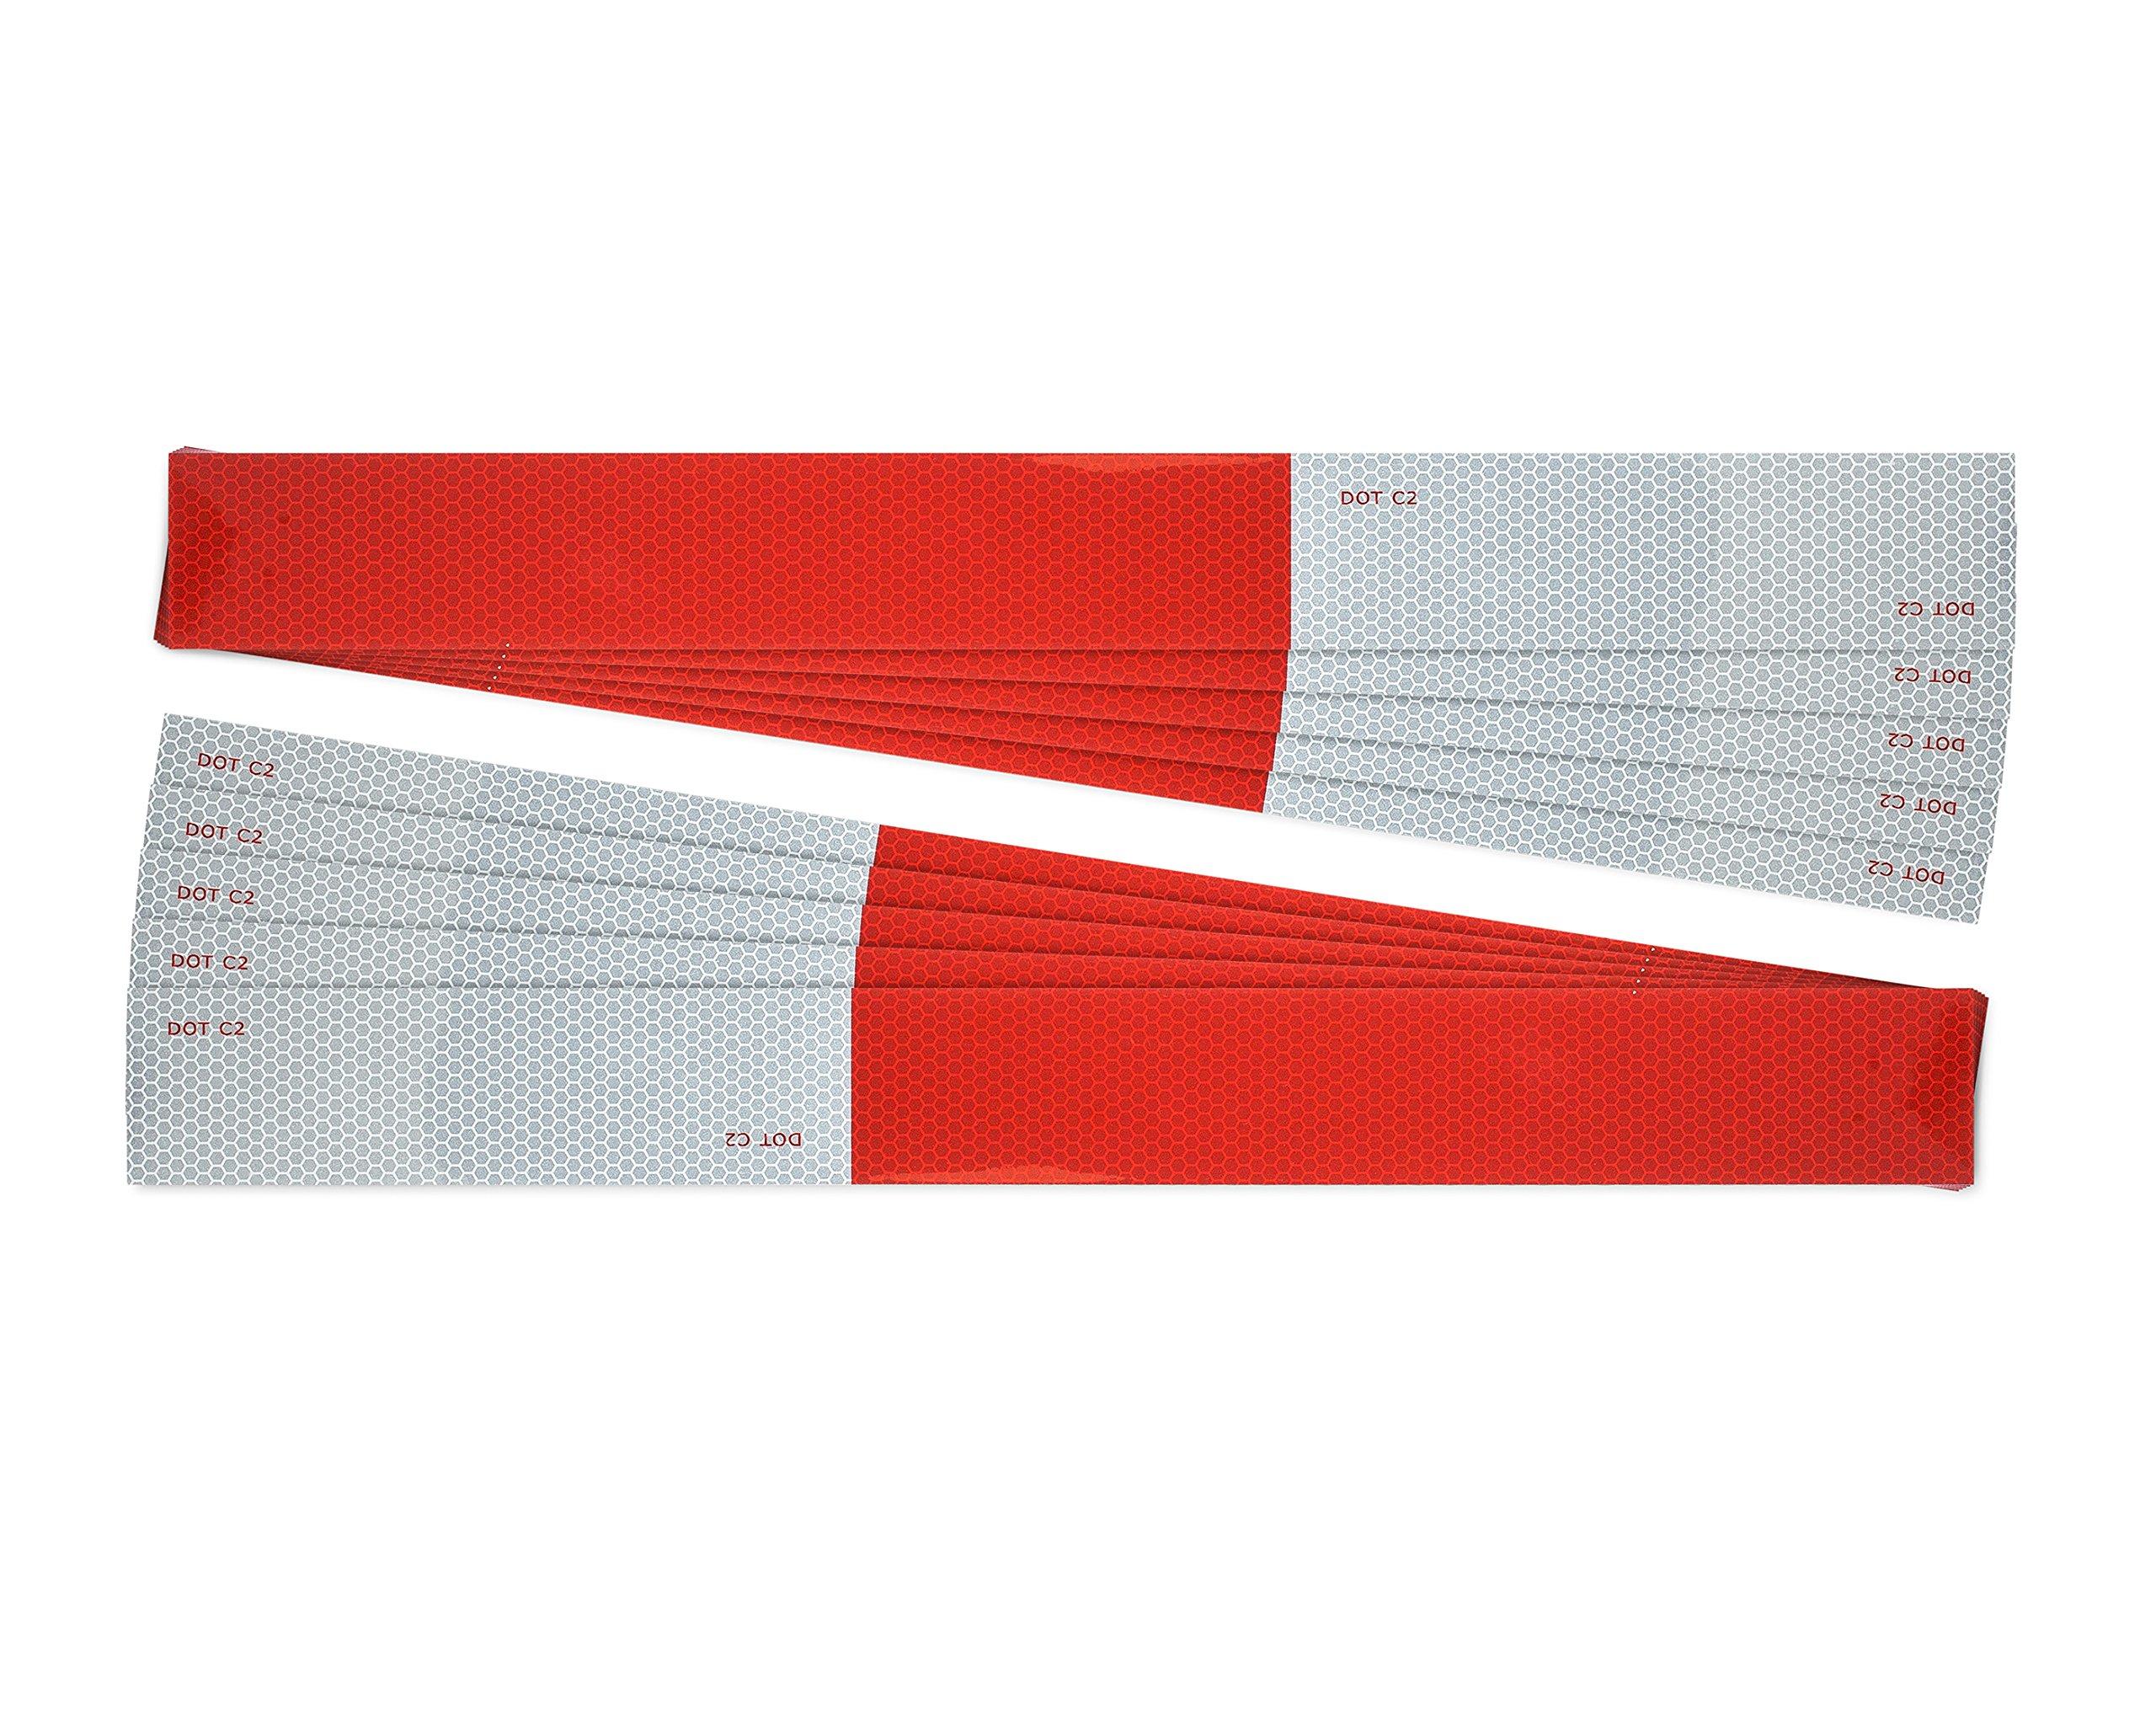 Premium DOT-C2 Reflective easy peel tape strips 2''x18'' (10 pack) DOT tape DOT reflective tape, red and white reflective tape for trailers and trucks dot reflectors